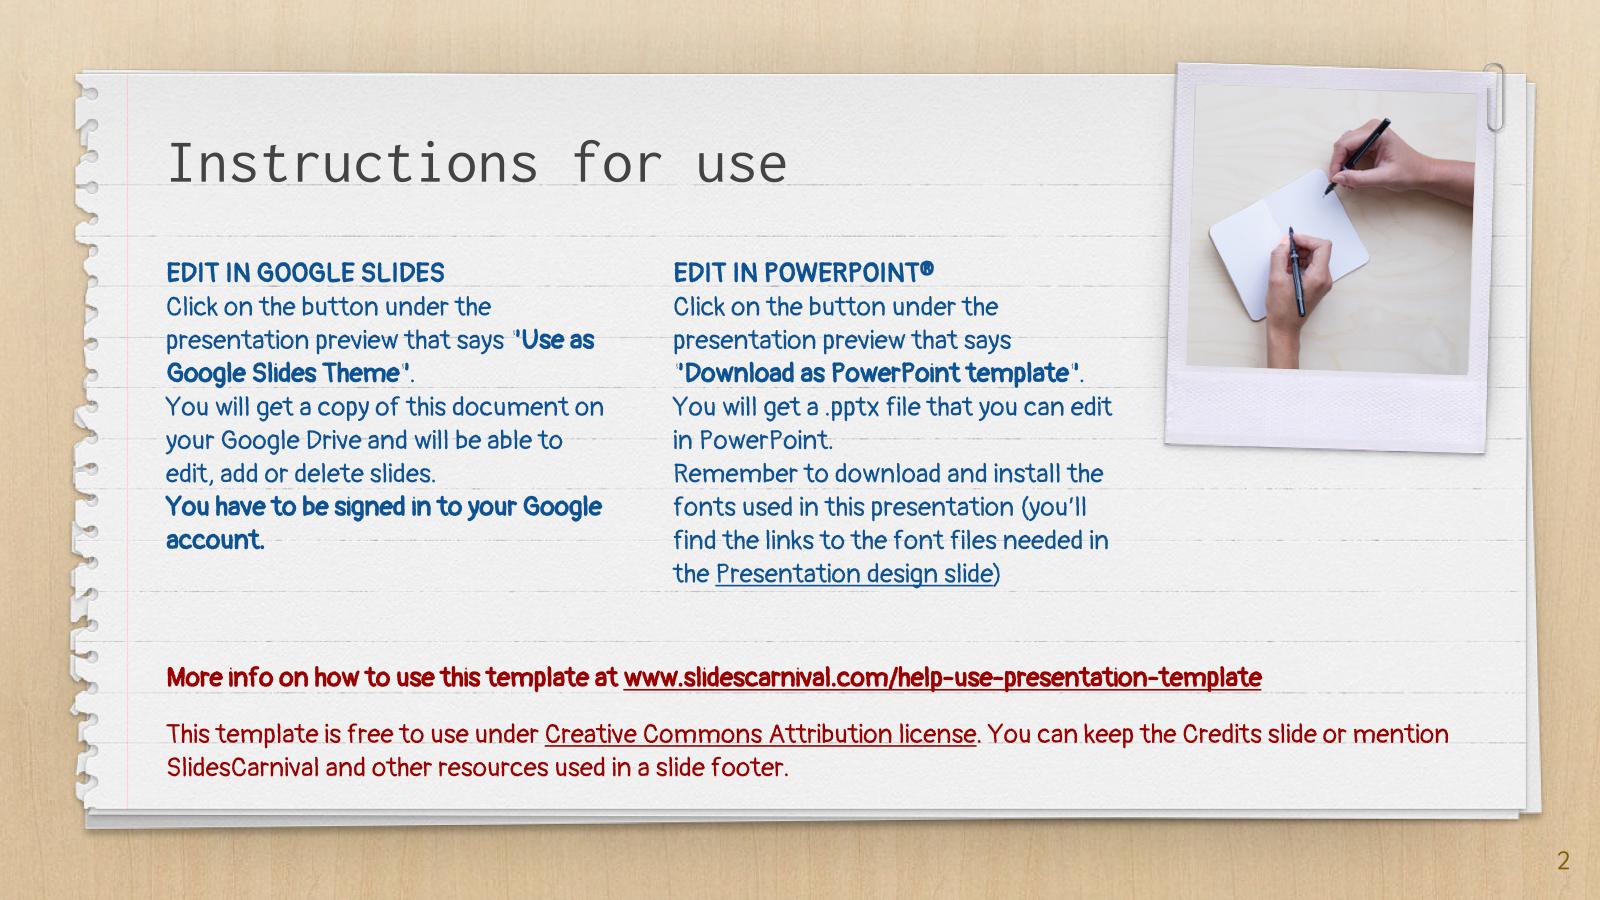 jaques - free powerpoint template & google slides theme - freebie, Modern powerpoint